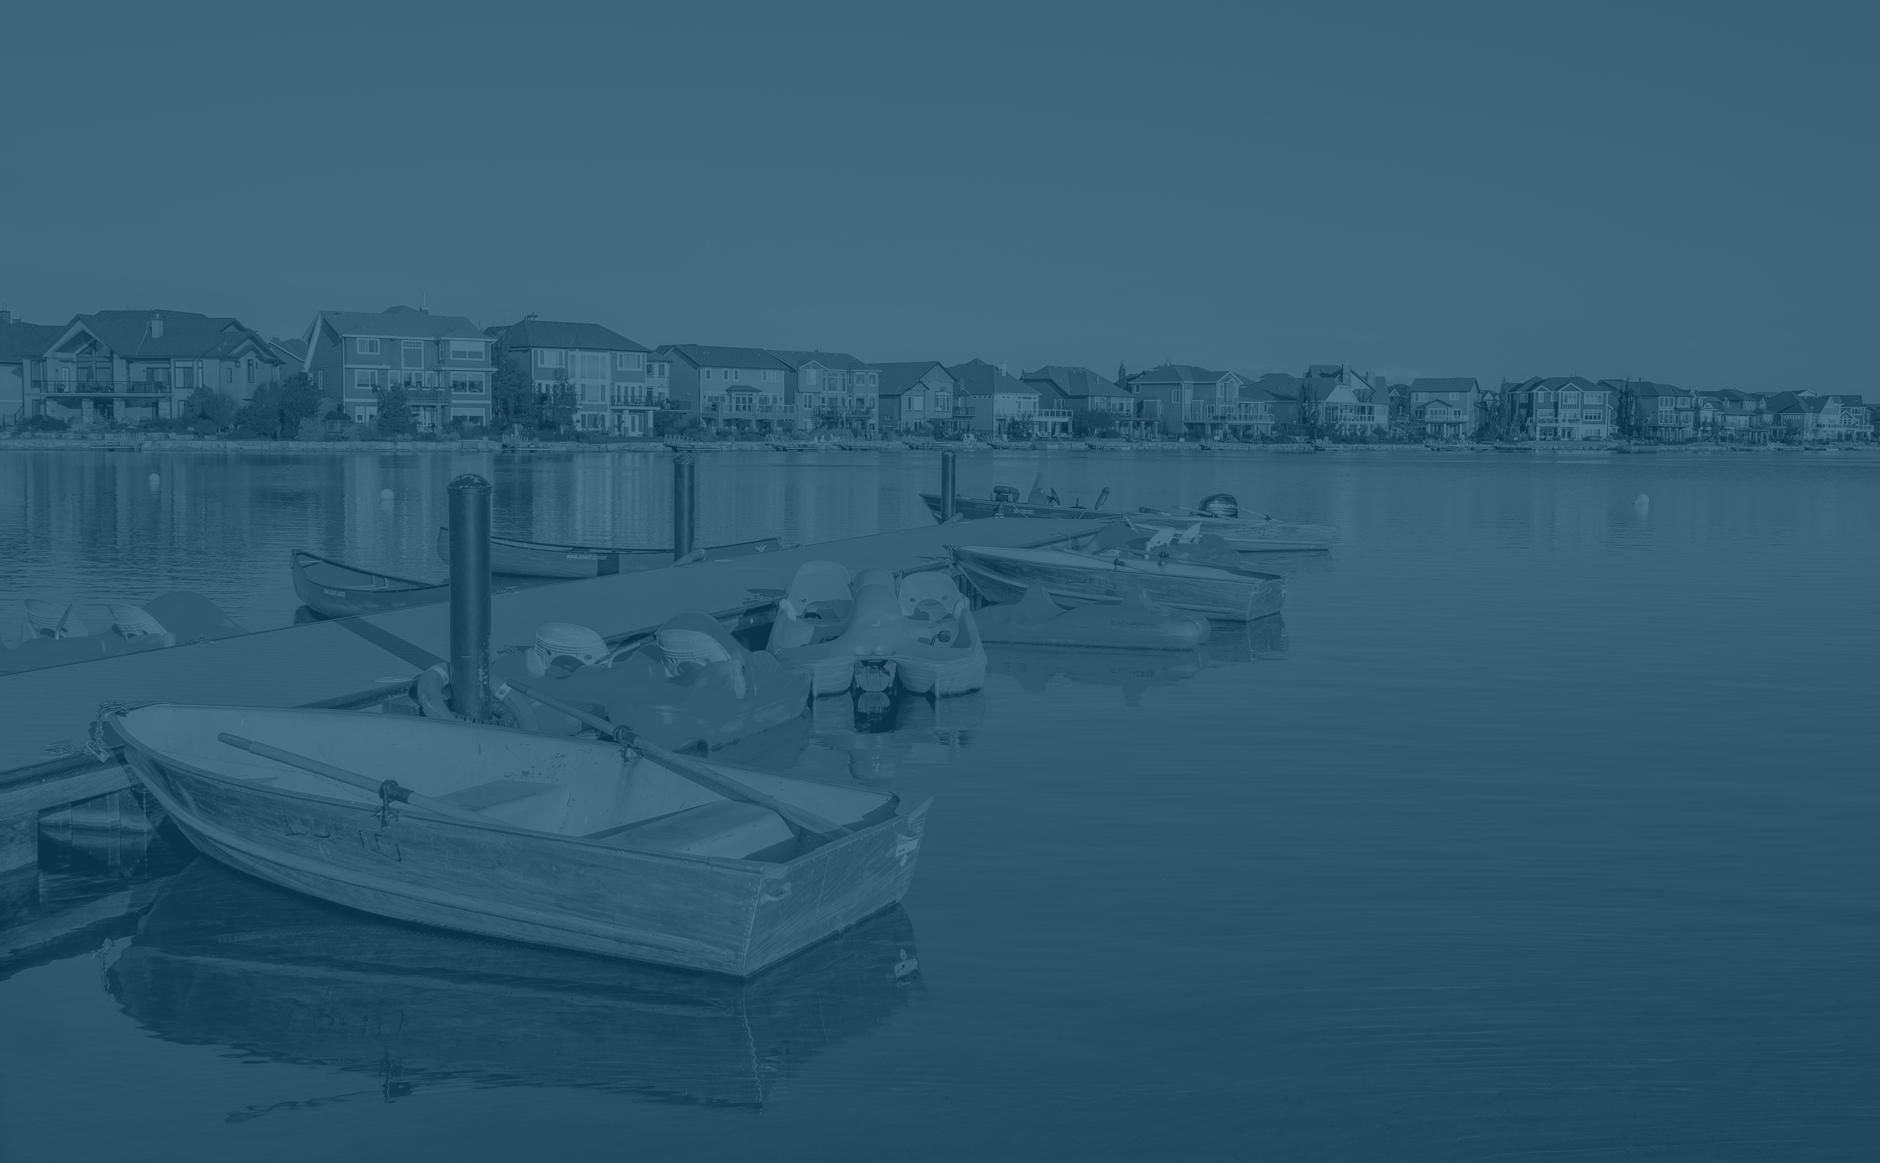 regatta-overlay-image